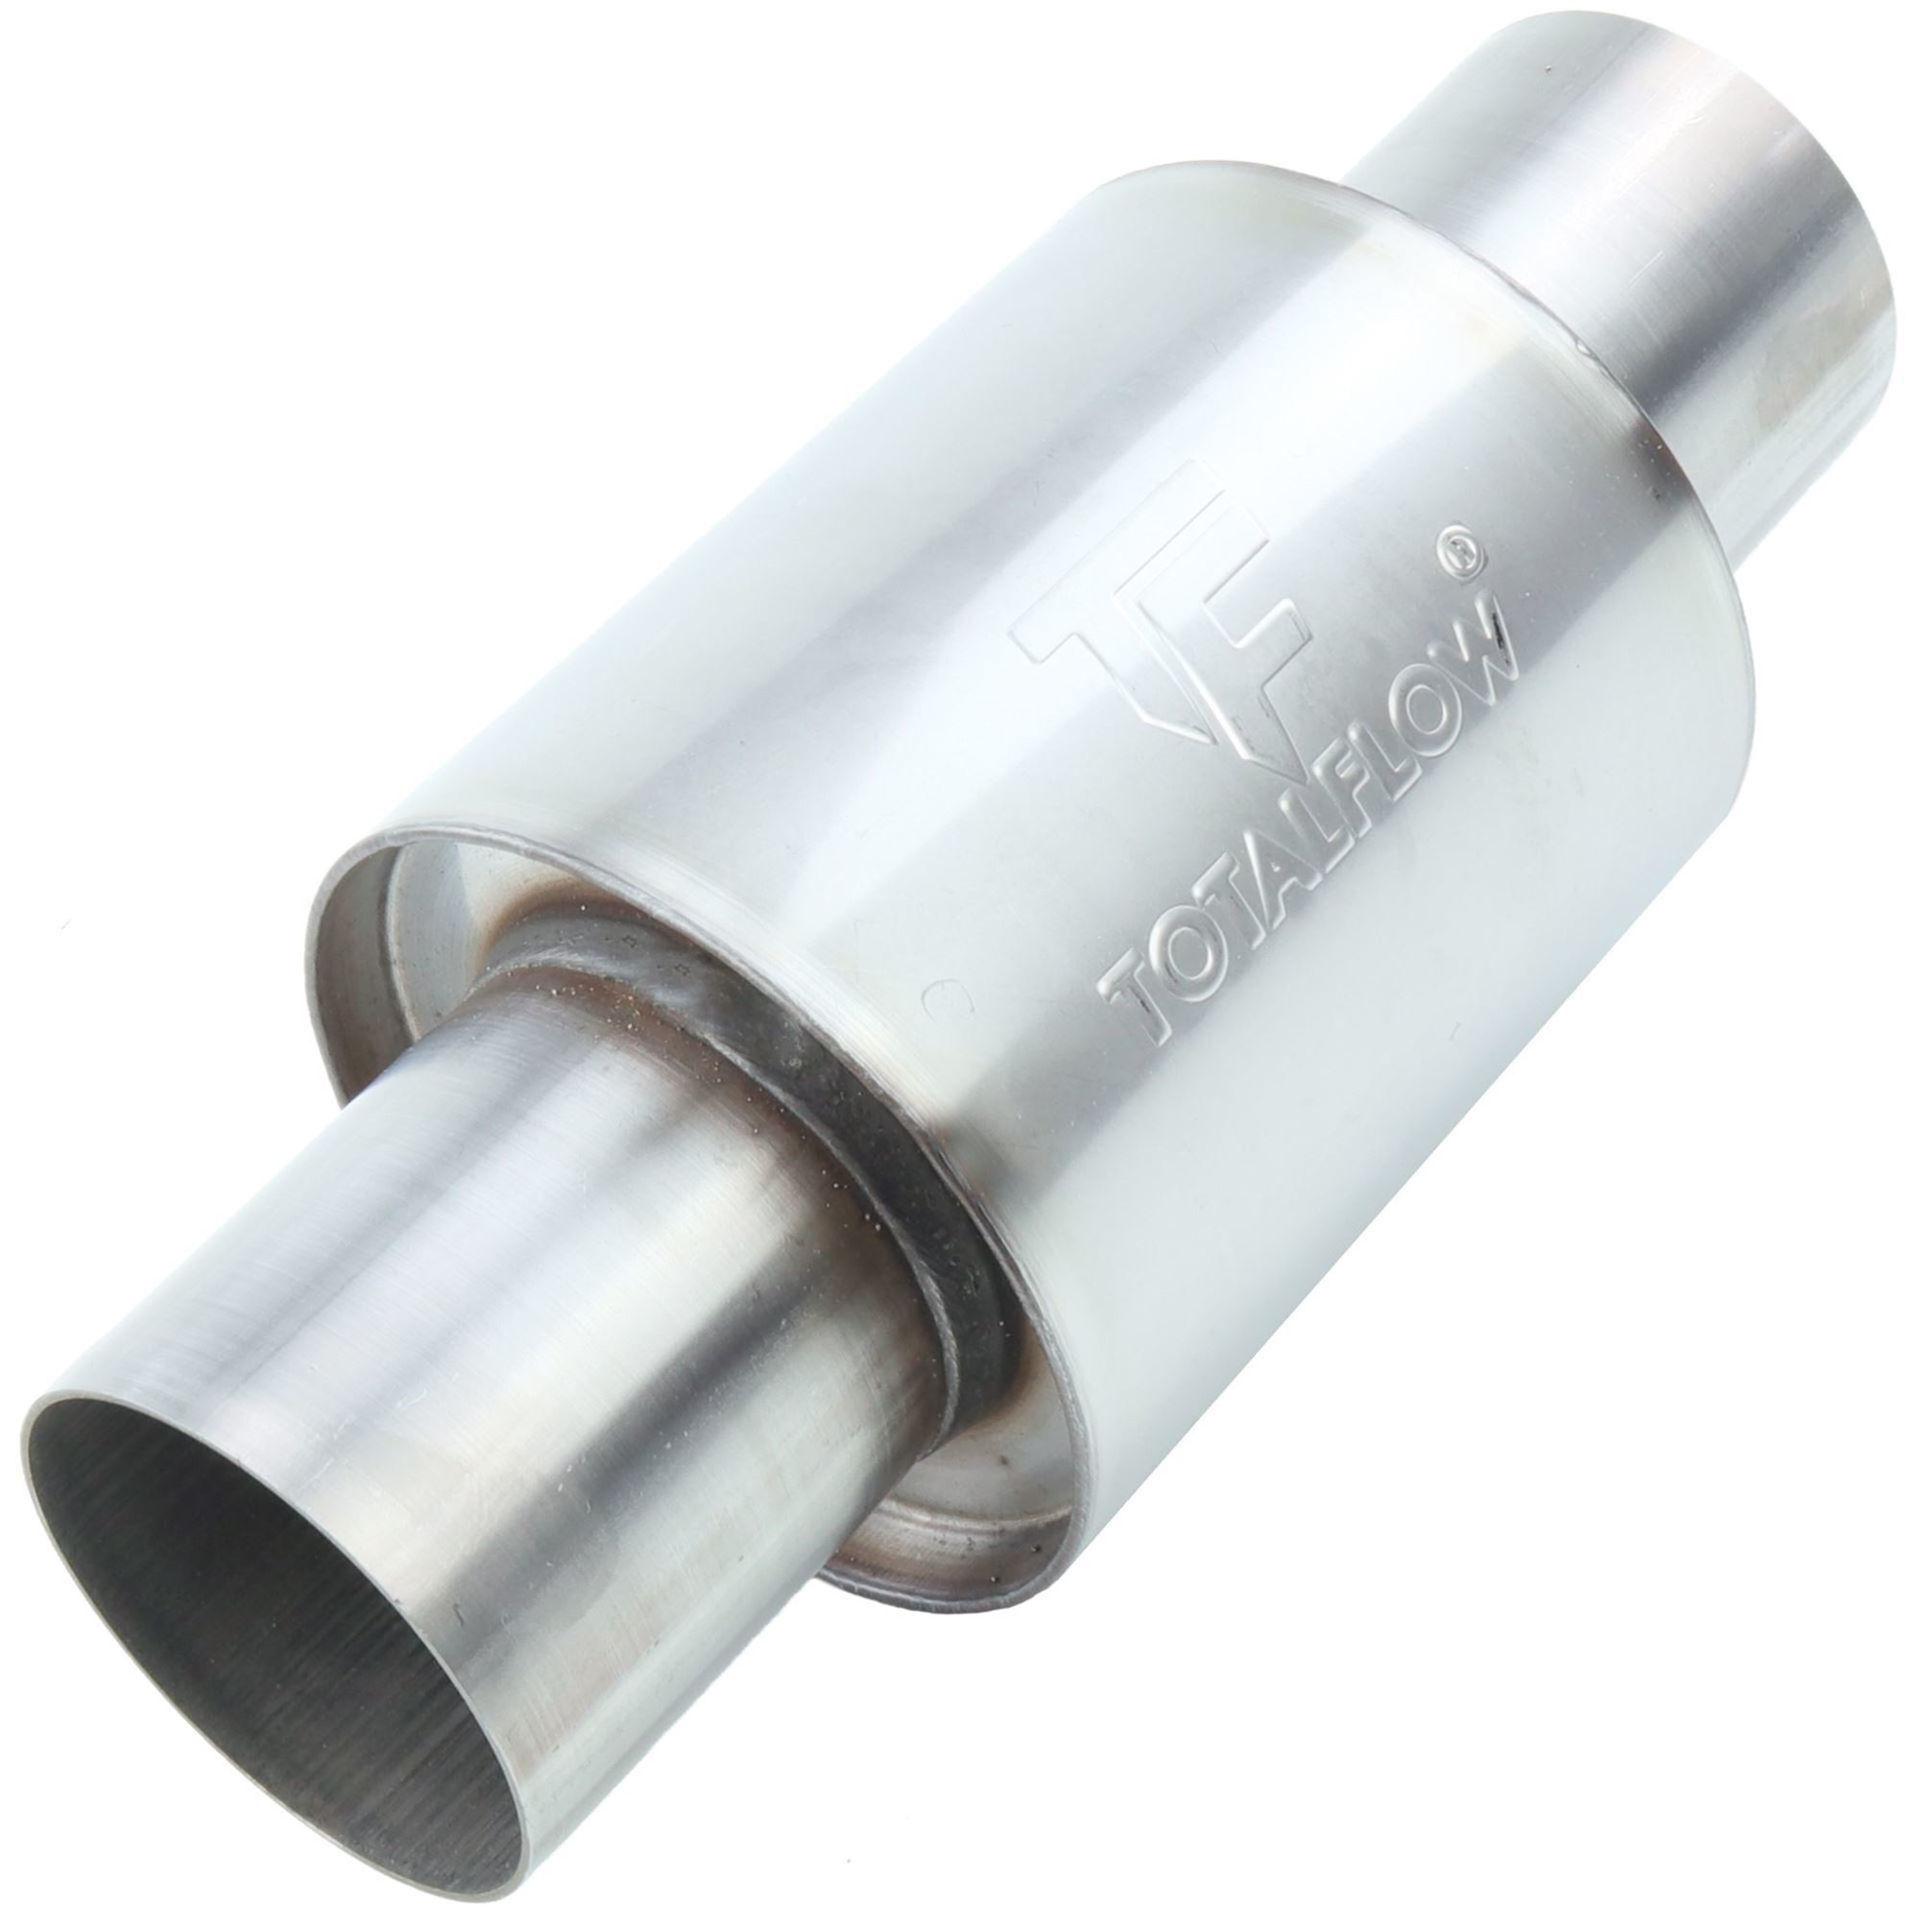 304 Stainless Steel 3 Inch Inner Diameter Inlet//Outlet TOTALFLOW 22119 Straight Through Universal Exhaust Muffler